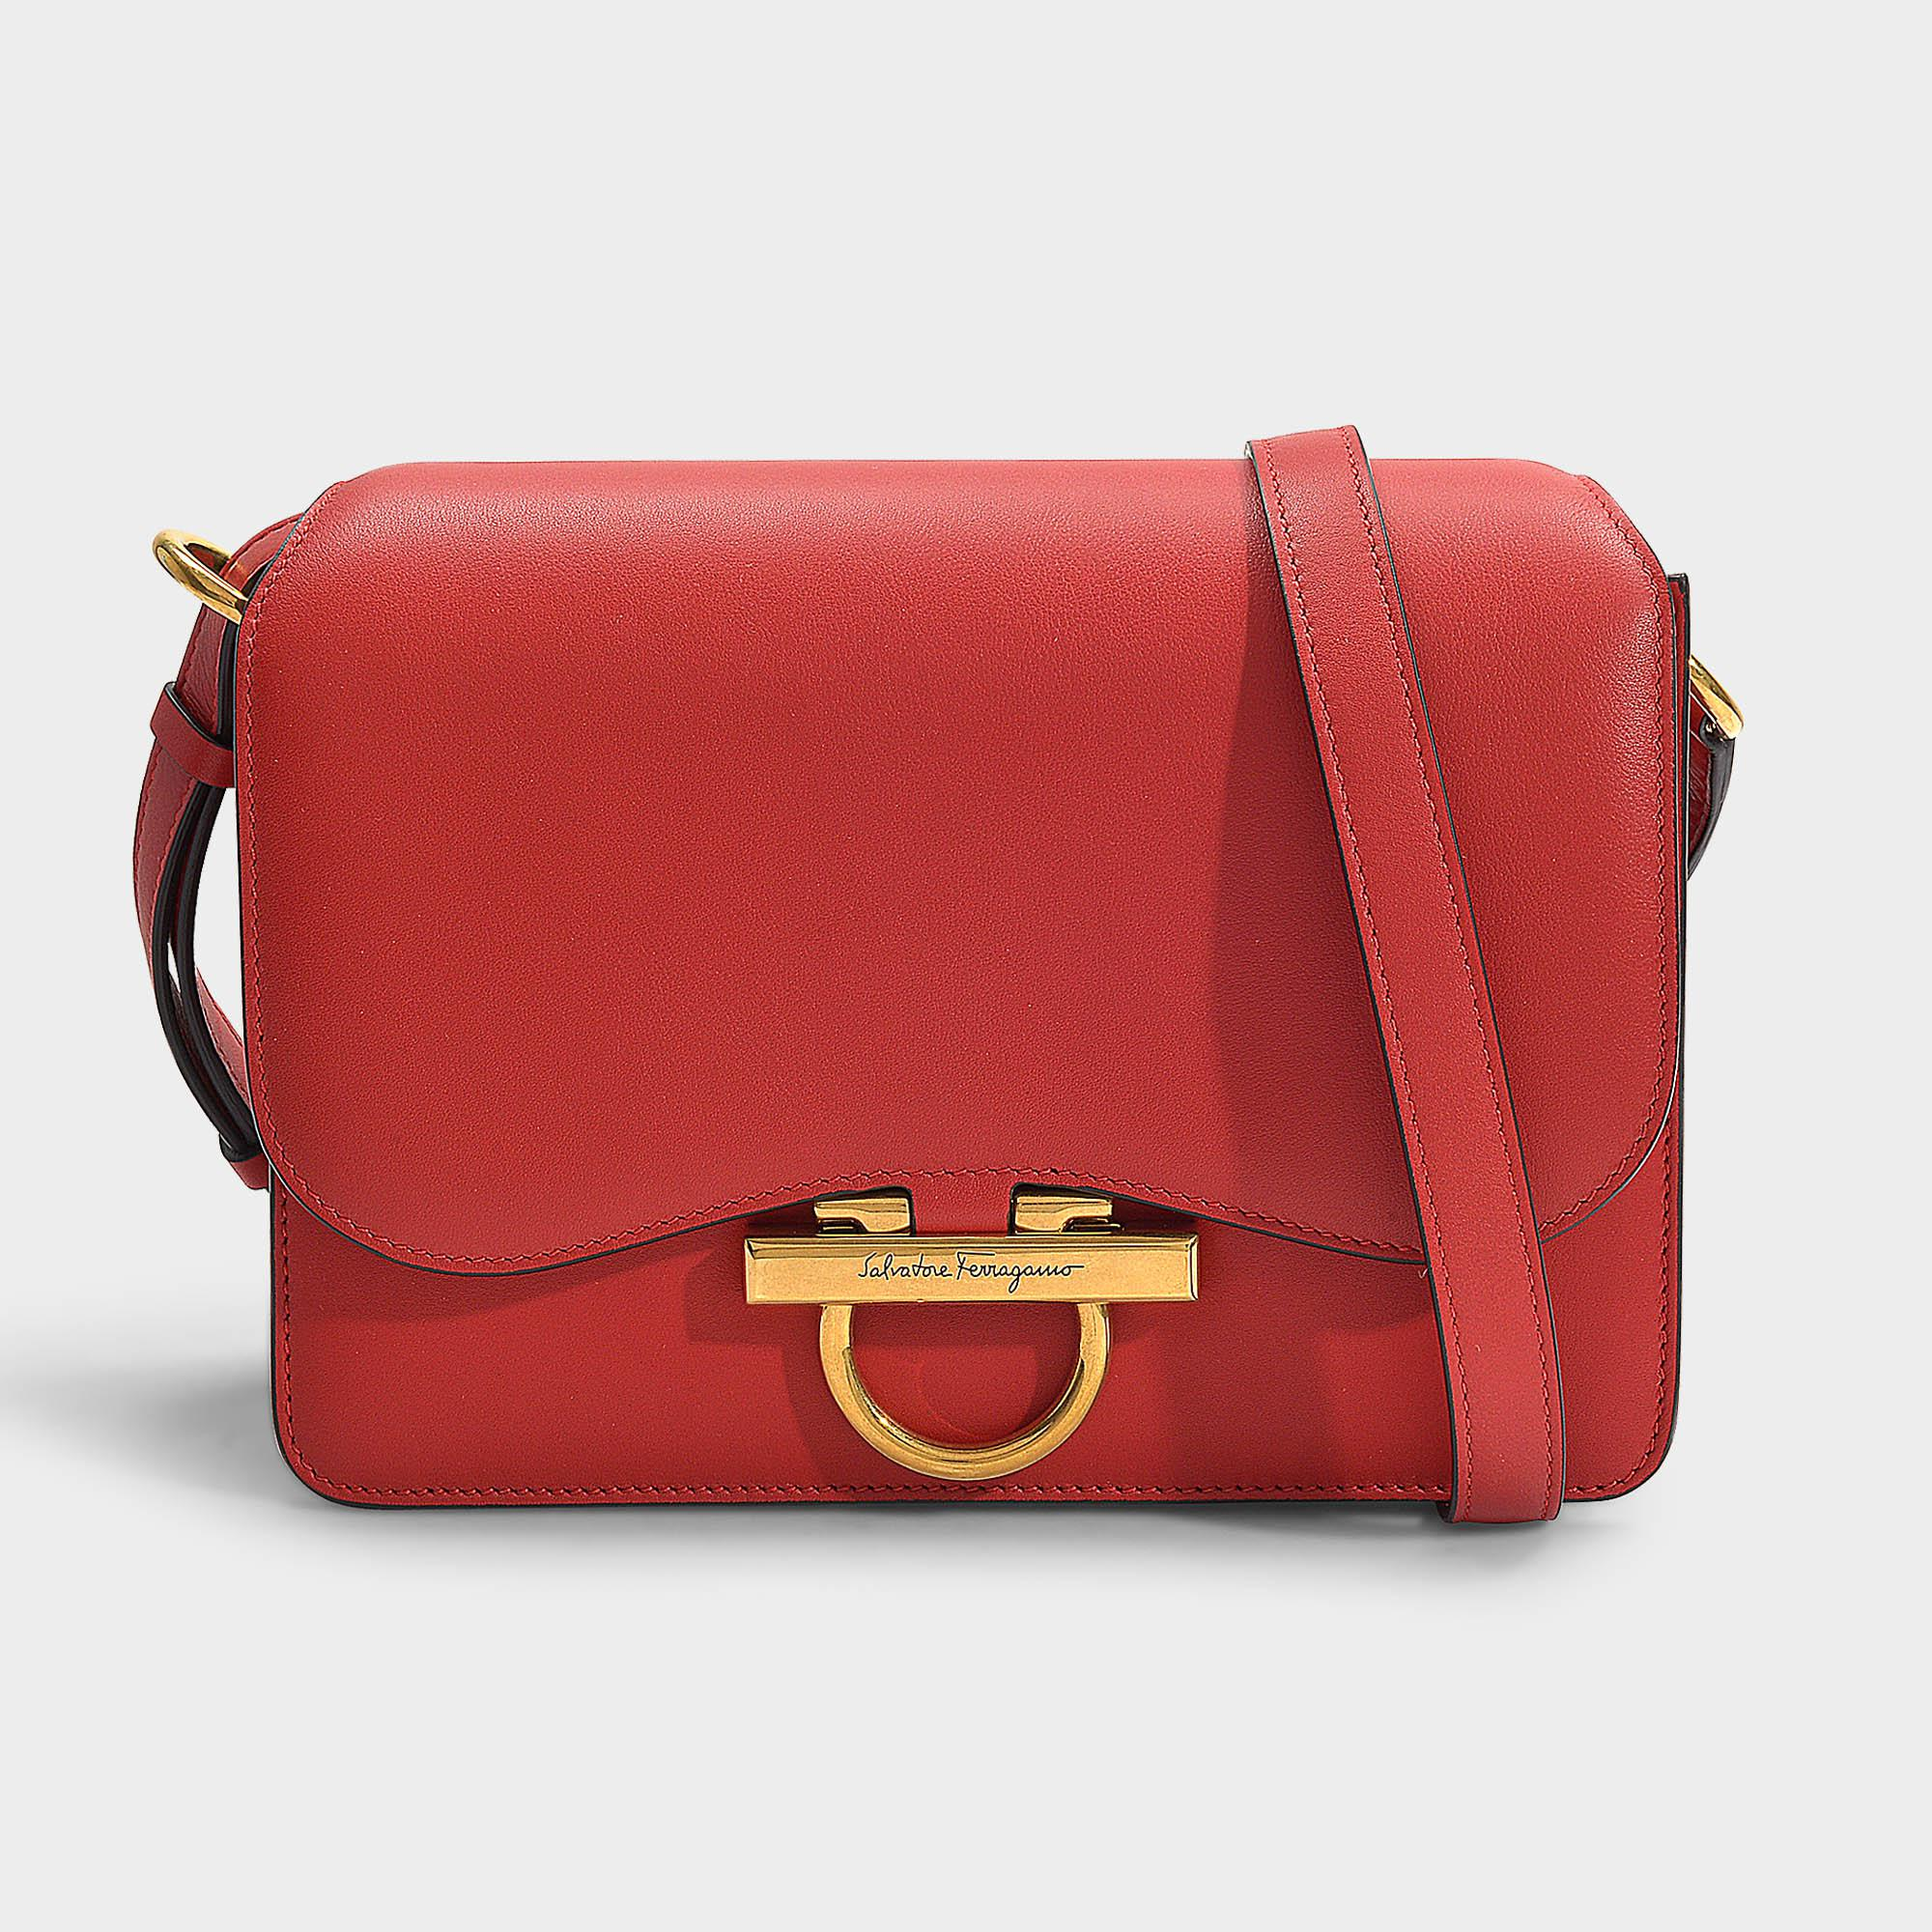 8839df2718 Lyst - Ferragamo Joanne Flap Bag In Red Calfskin in Red - Save 4%